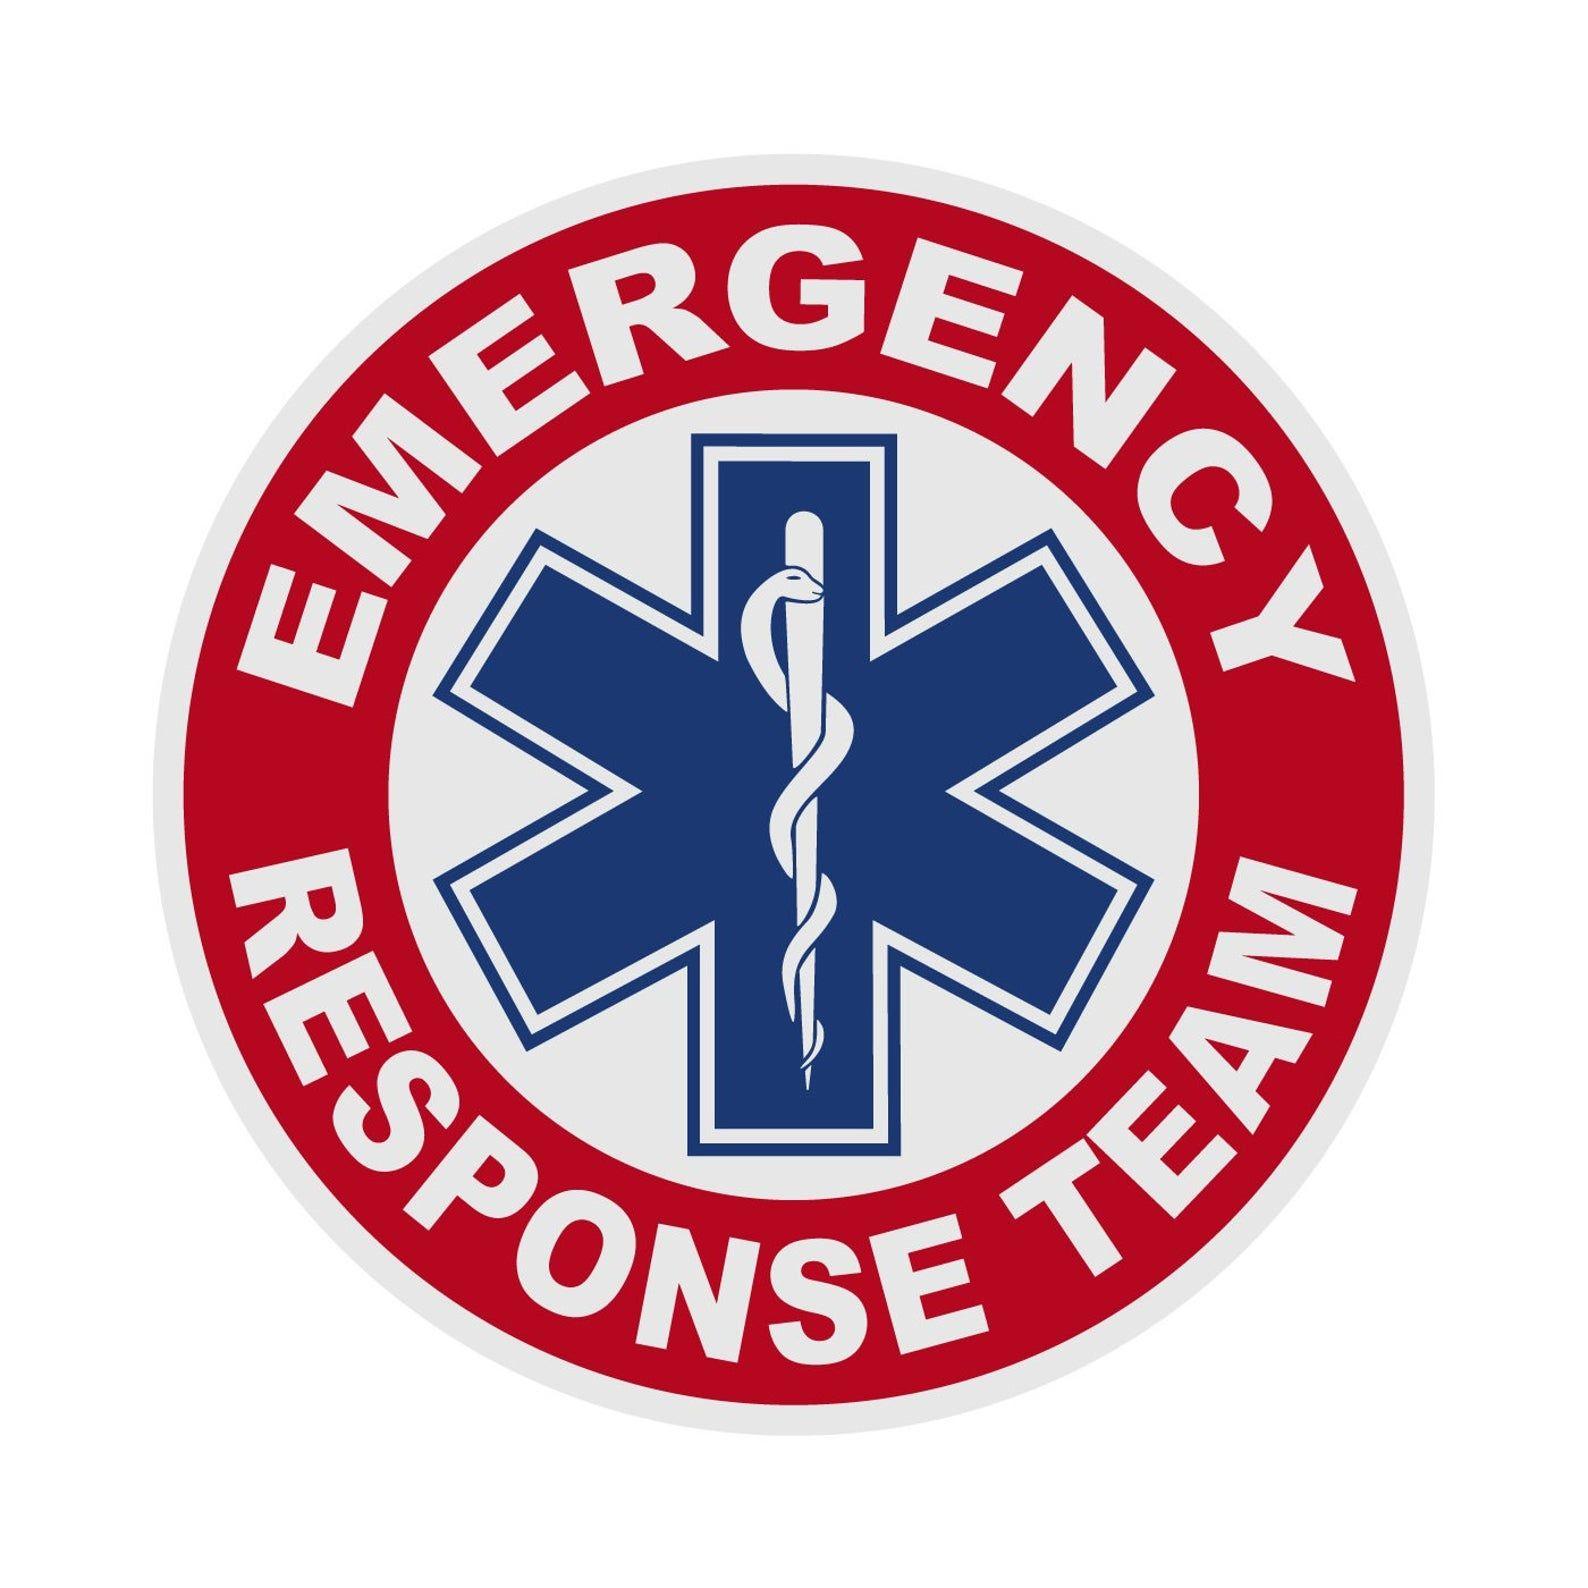 Emergency Response Team Round Sticker Firefighter Rescue Reflective Car Window Decal Sticker Star Of Life Fireman Emt In 2021 Emergency Response Team Emergency Response Reflective Decals [ 1588 x 1588 Pixel ]